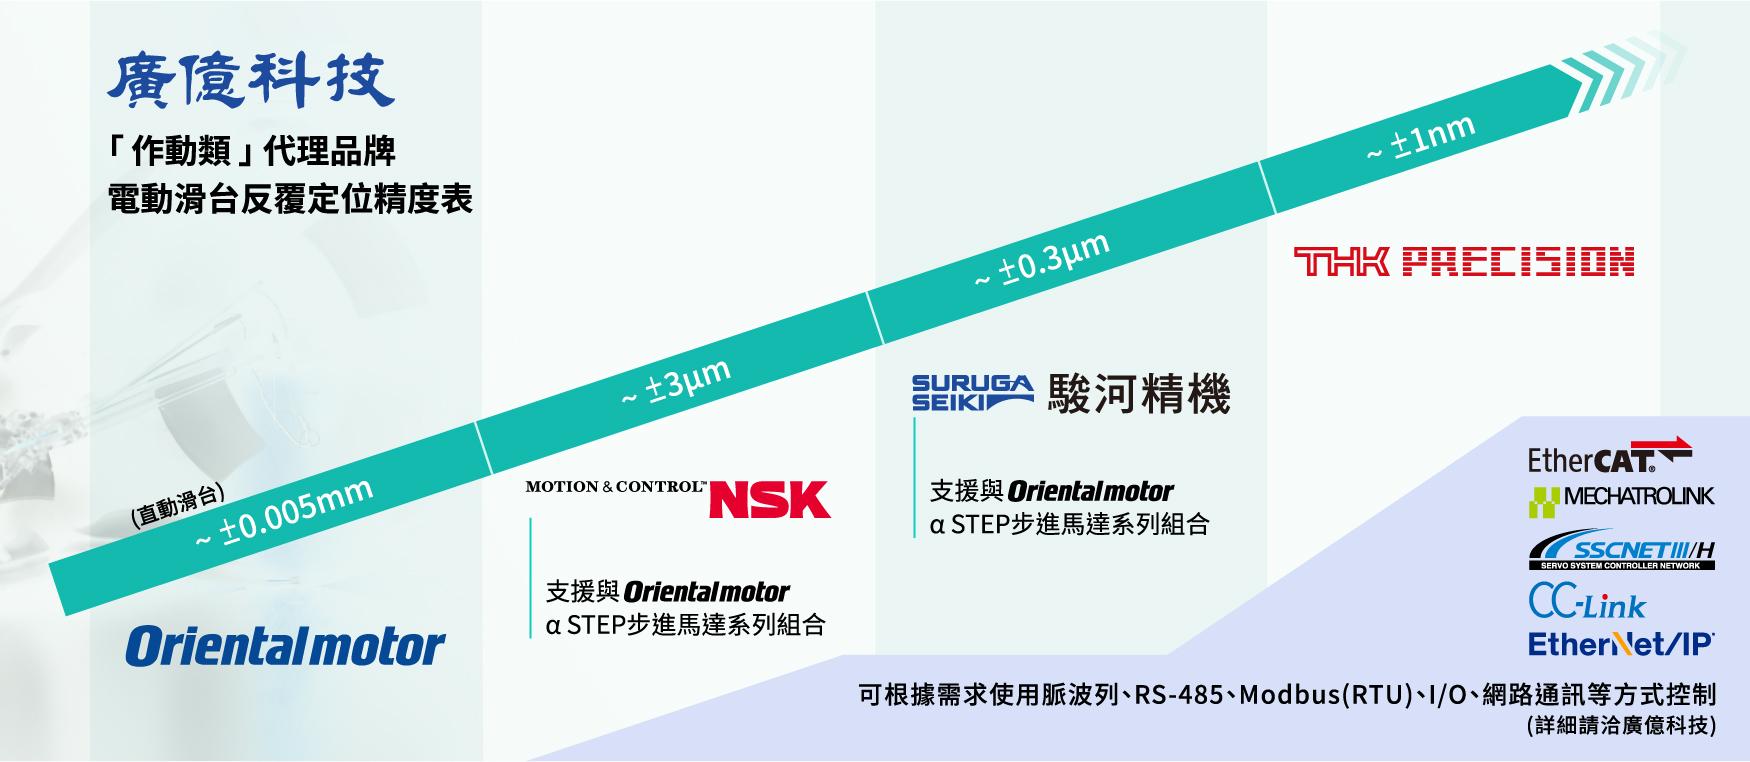 Orientalmotor_NSK_SURUGA_THK_PRECISION